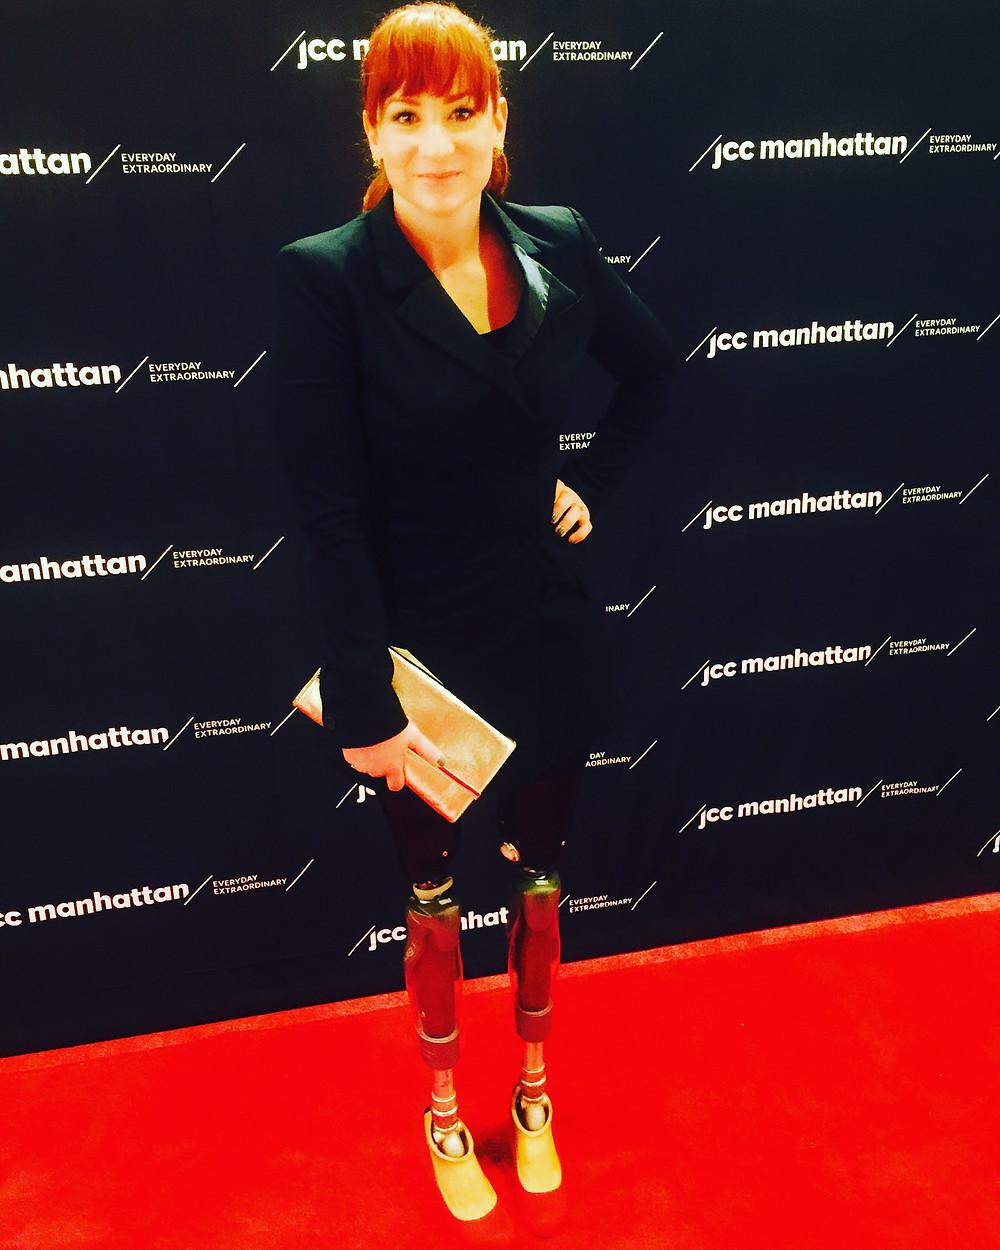 Red Carpet at the JCC Manhattan for the Reel Abilities Film Festival